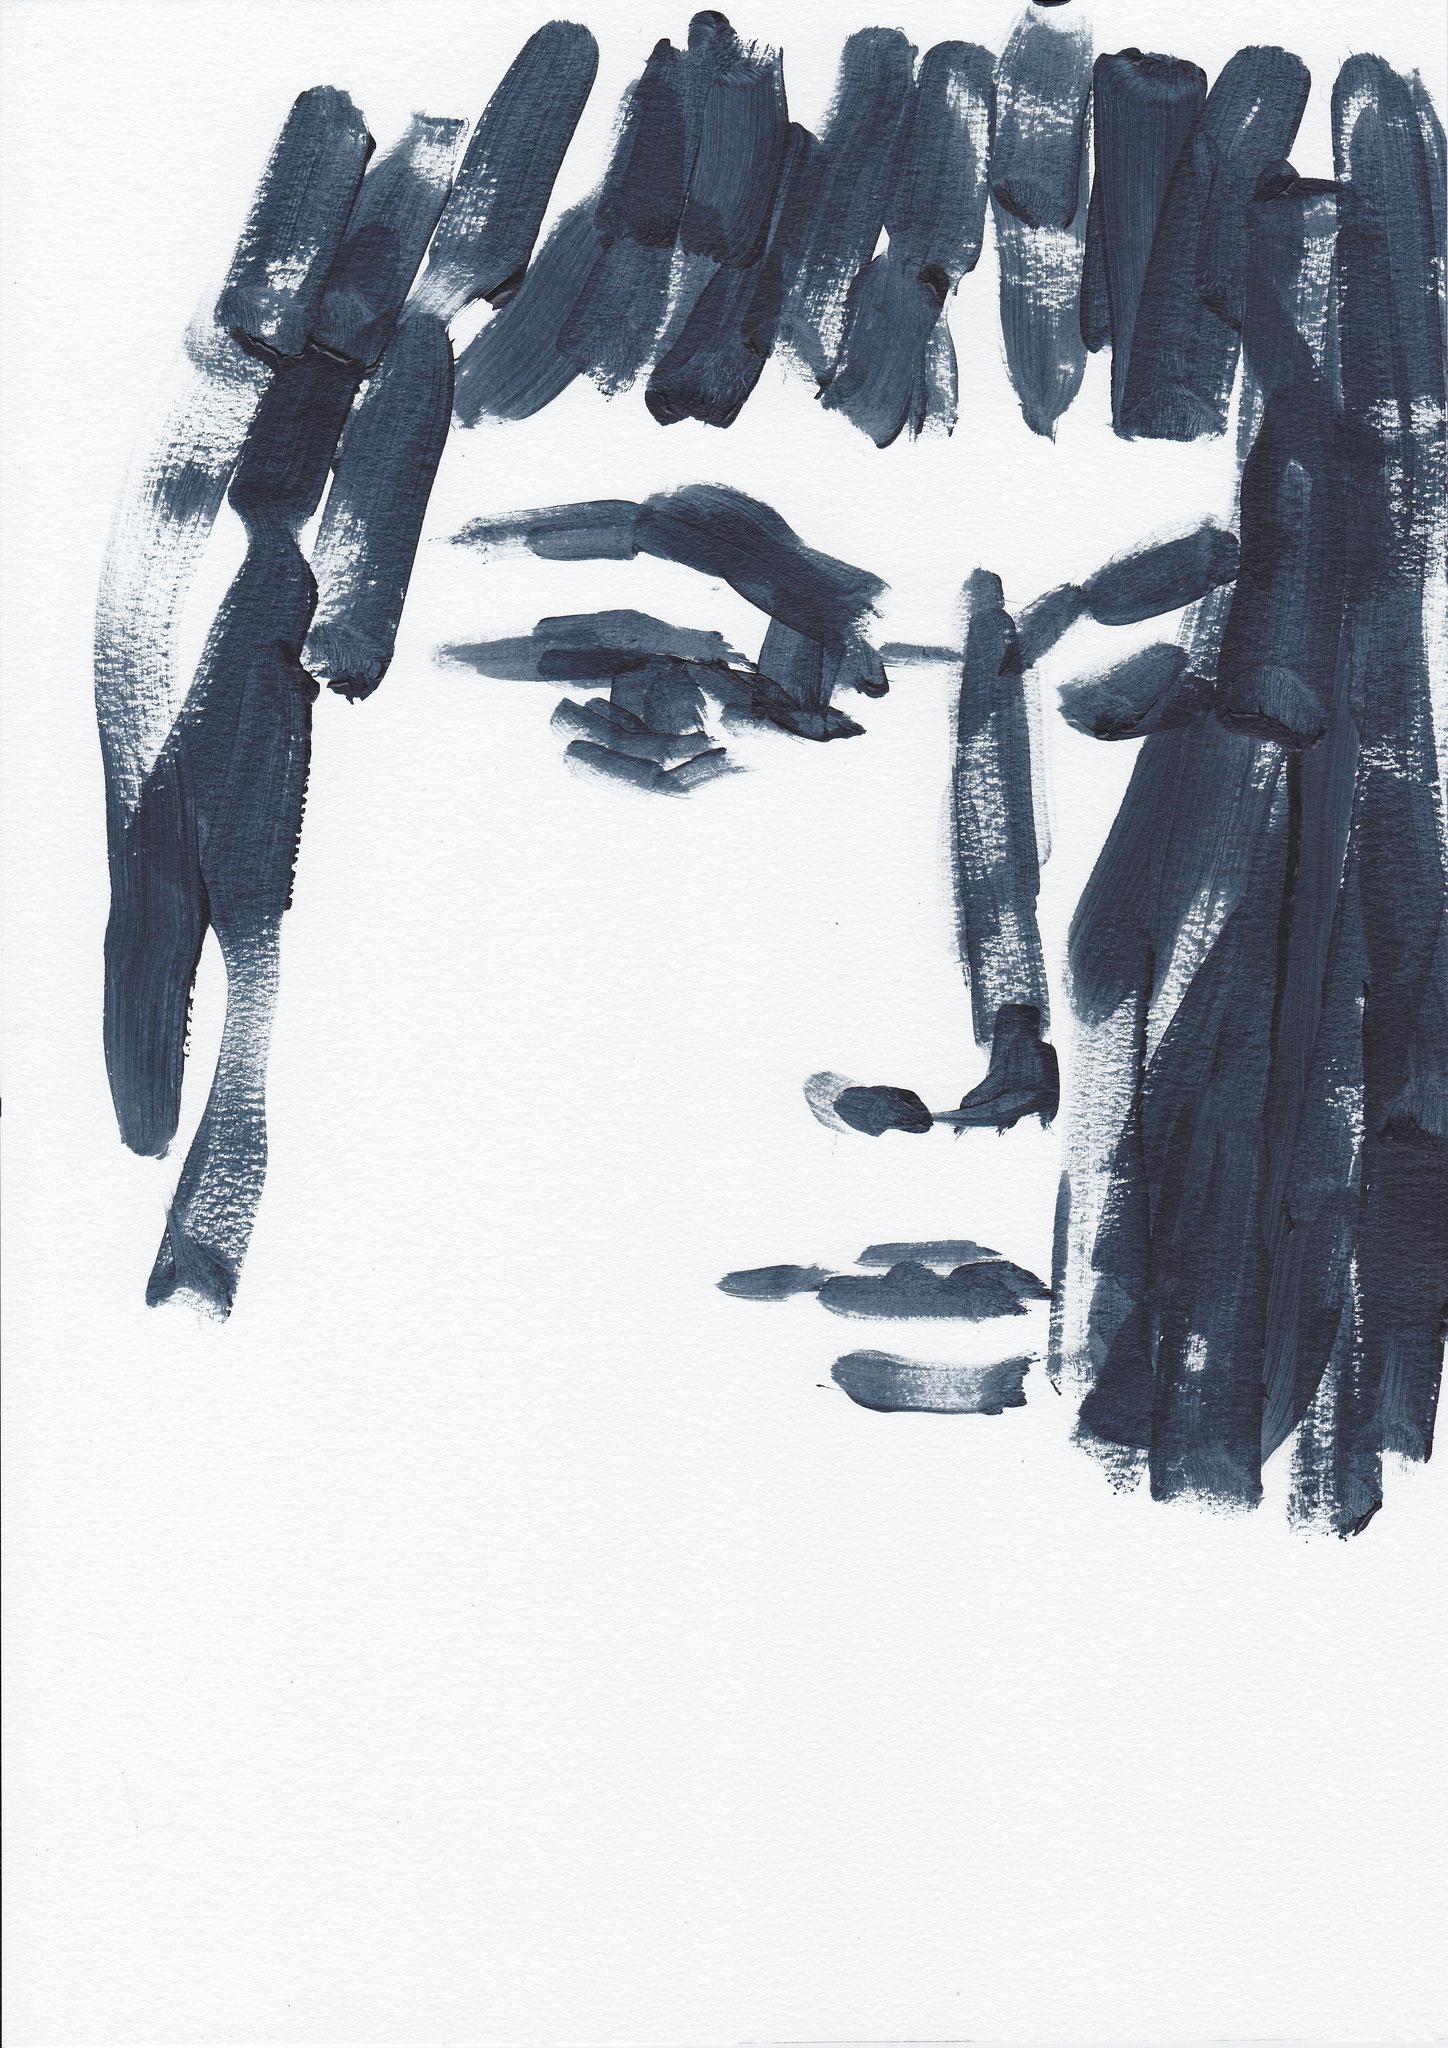 024 , acrylic on paper , 29.7 x 21cm , Selina Saranova